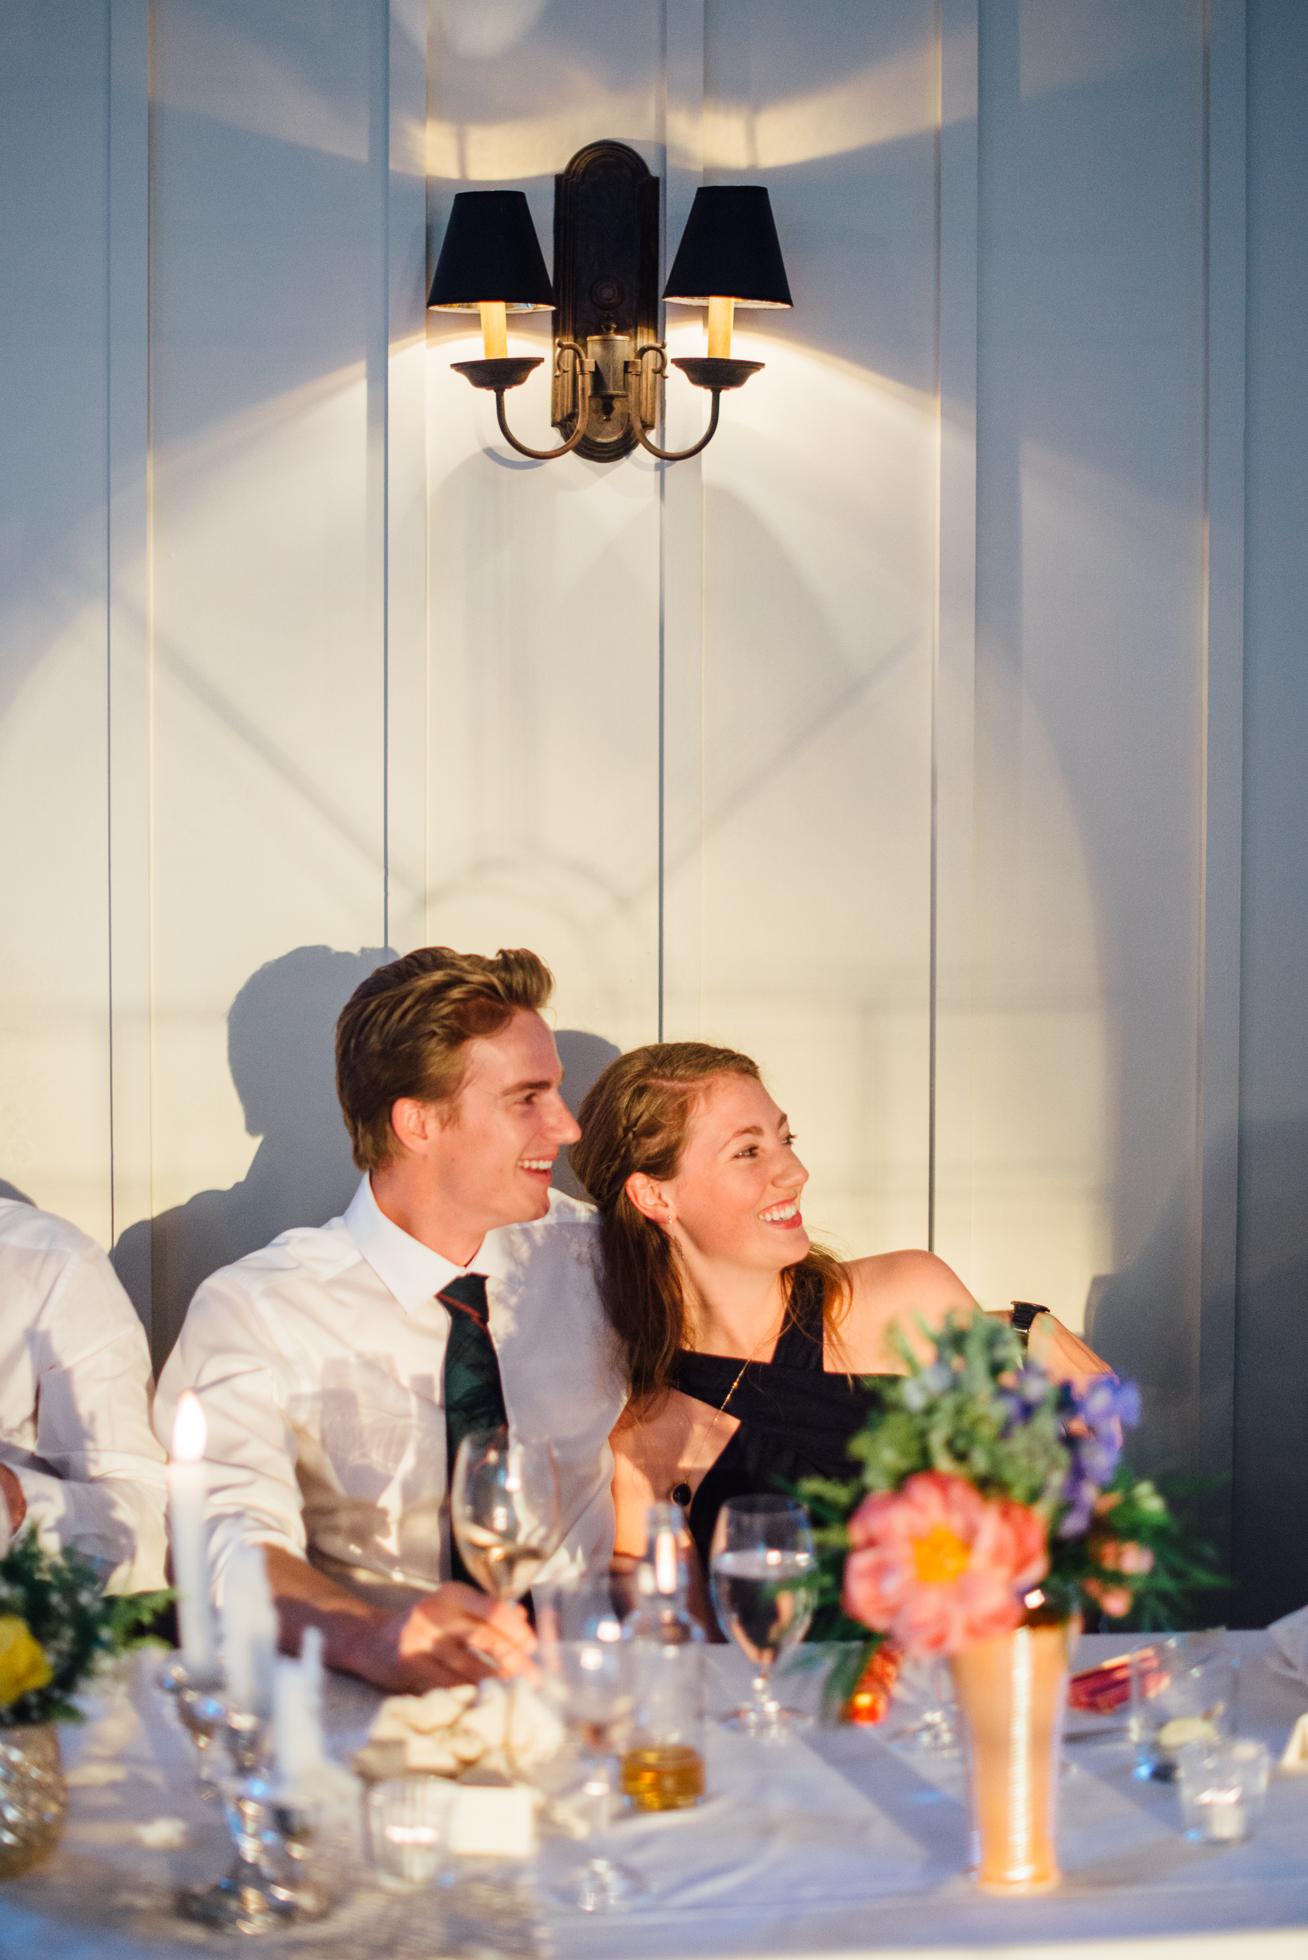 Outdoor-Caledon-Tralee-Wedding-Photography-108